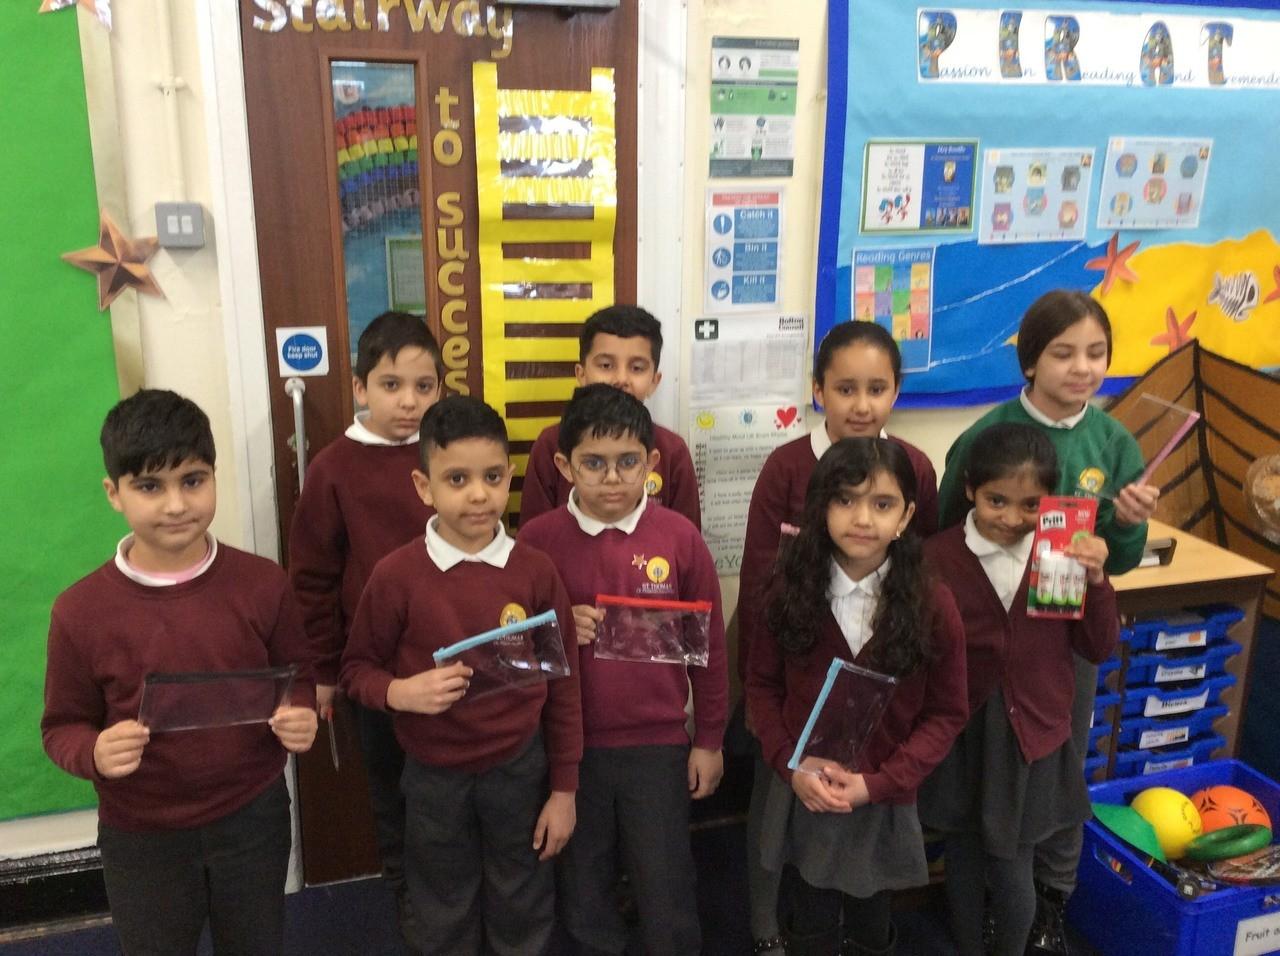 Getting Schools Back On Track grant. | Asda Bolton